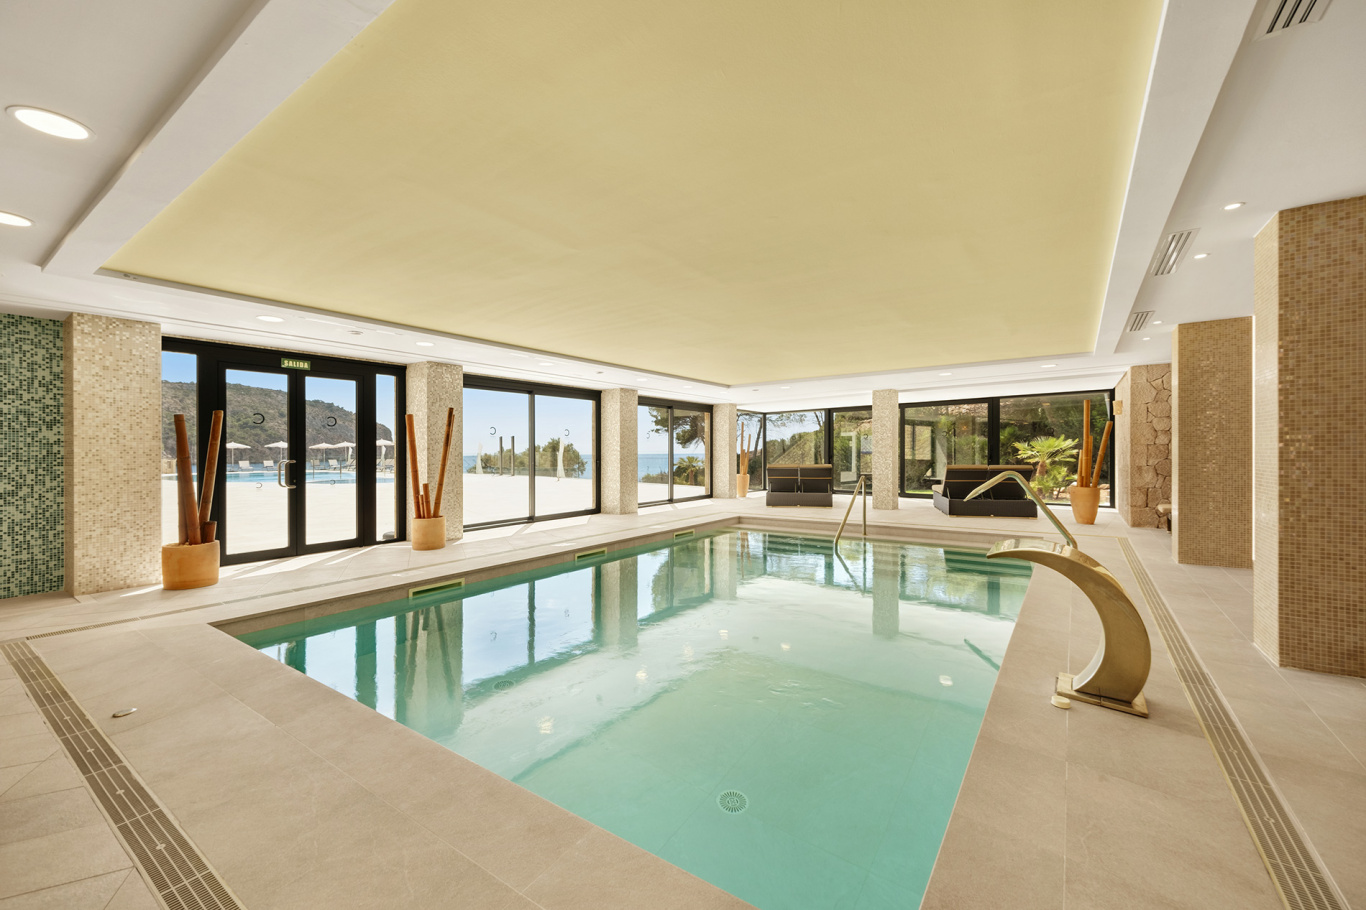 vistas-spa-bahia-suites